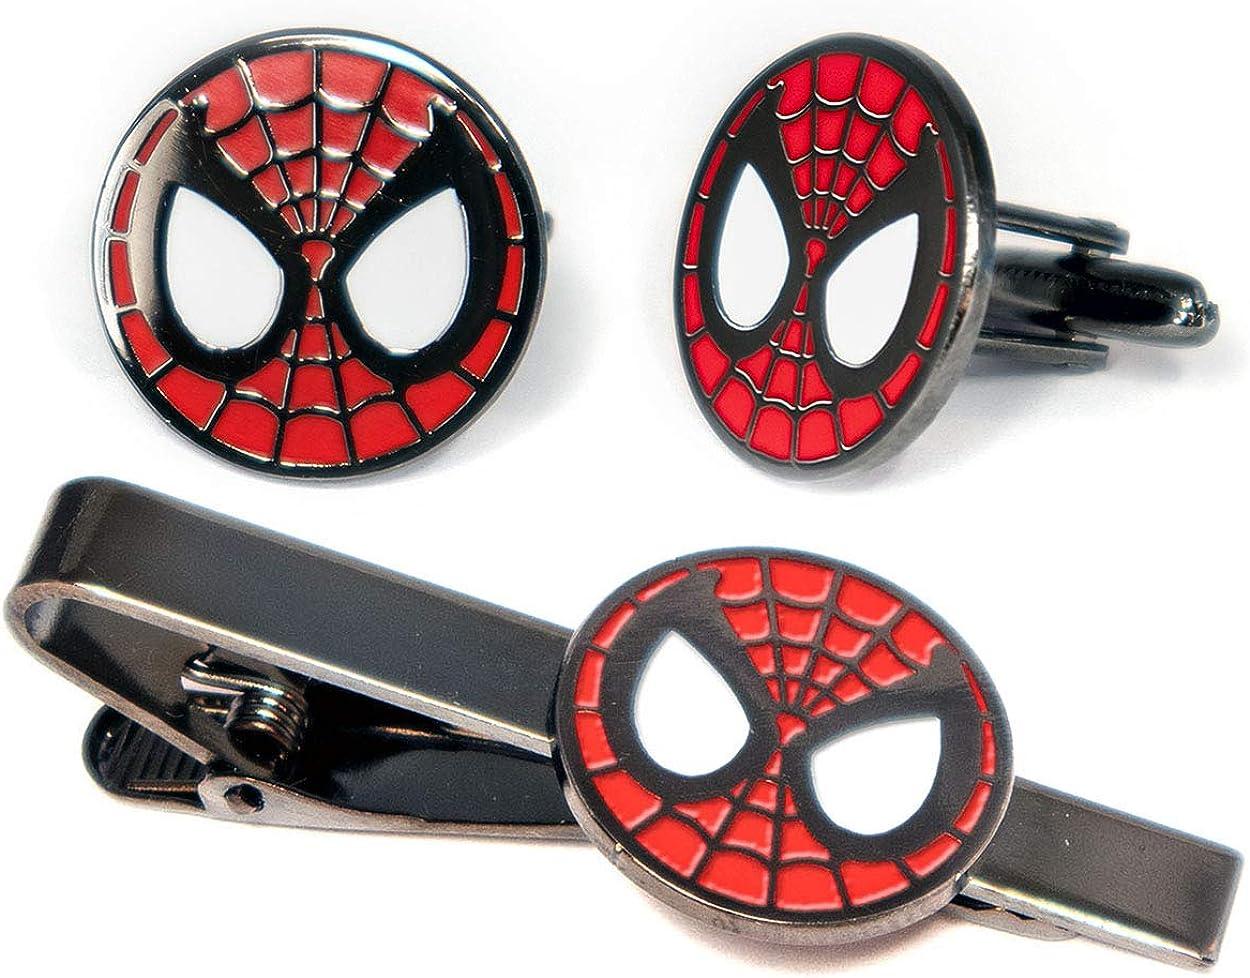 SharedImagination Spider-Man Cufflinks, Minimalist Marvel Avengers Tie Clip, Amazing Spiderman Jewelry, Ironman Captain America Tie Tack Present, Cuff Links Wedding Party Groomsmen Gift